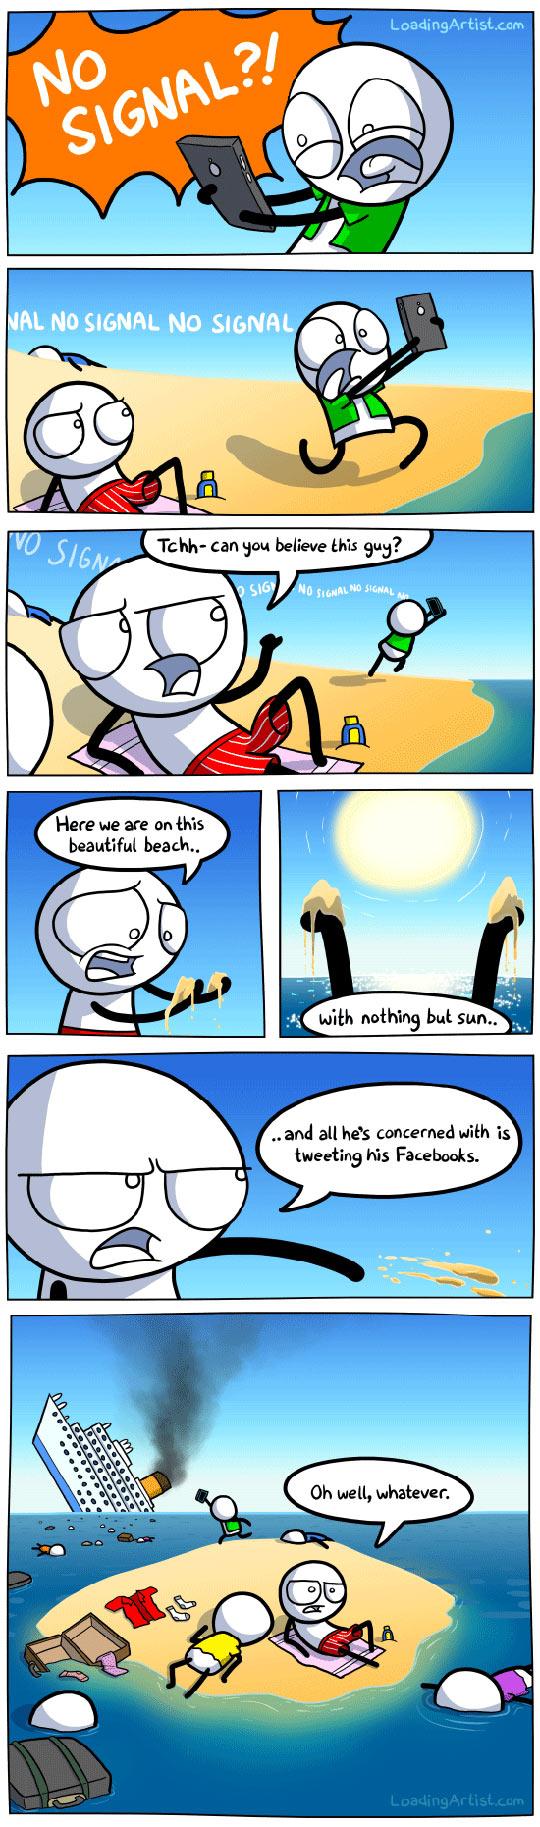 funny-comic-cellphone-signal-island